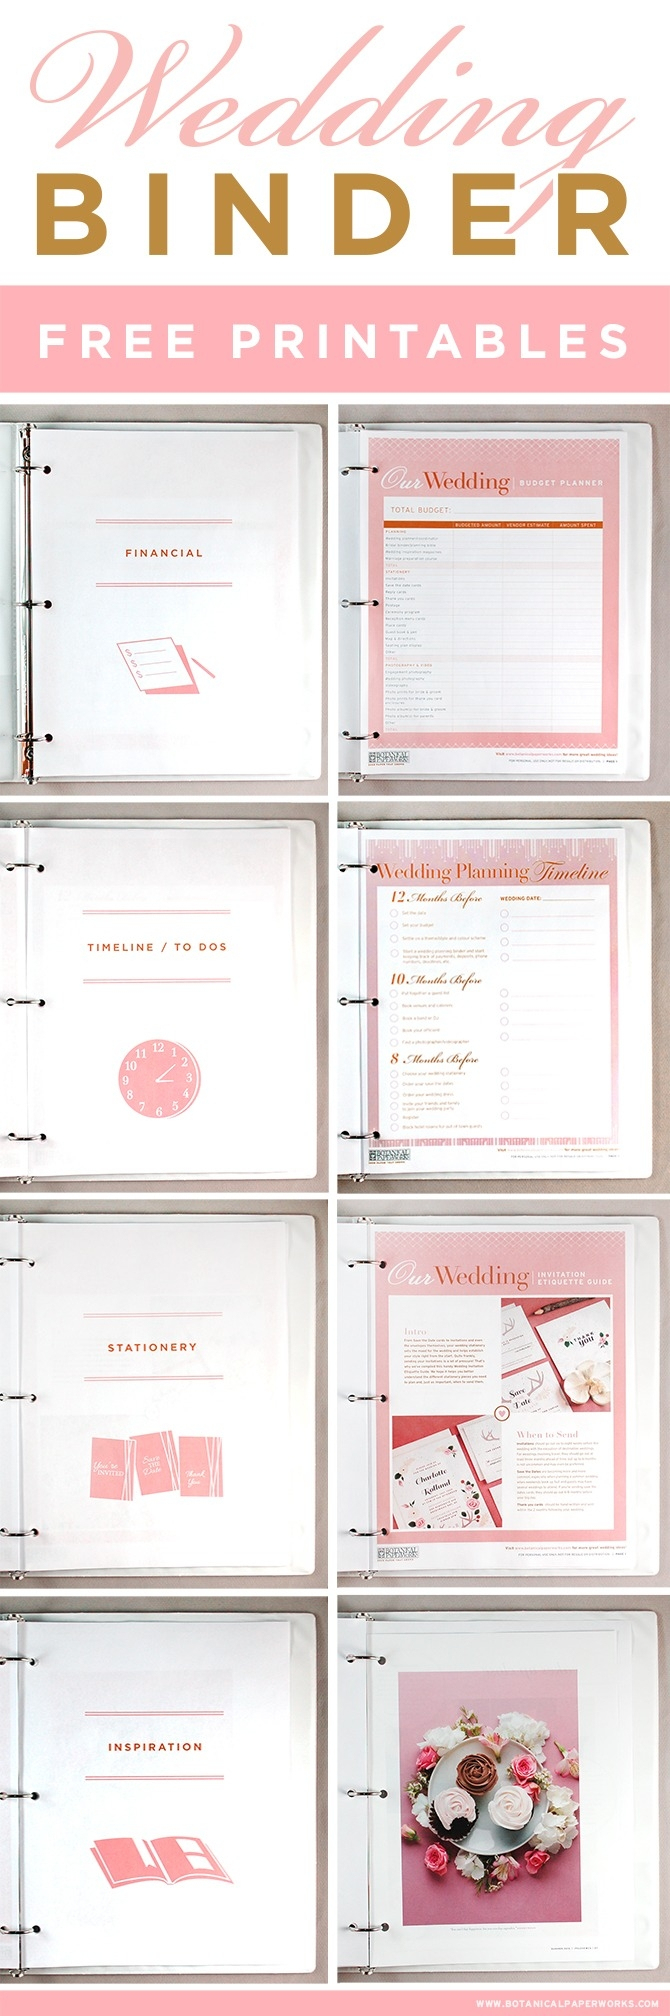 Free Printable Wedding Planner Book   Bestprintable231118 - Free Printable Wedding Planner Book